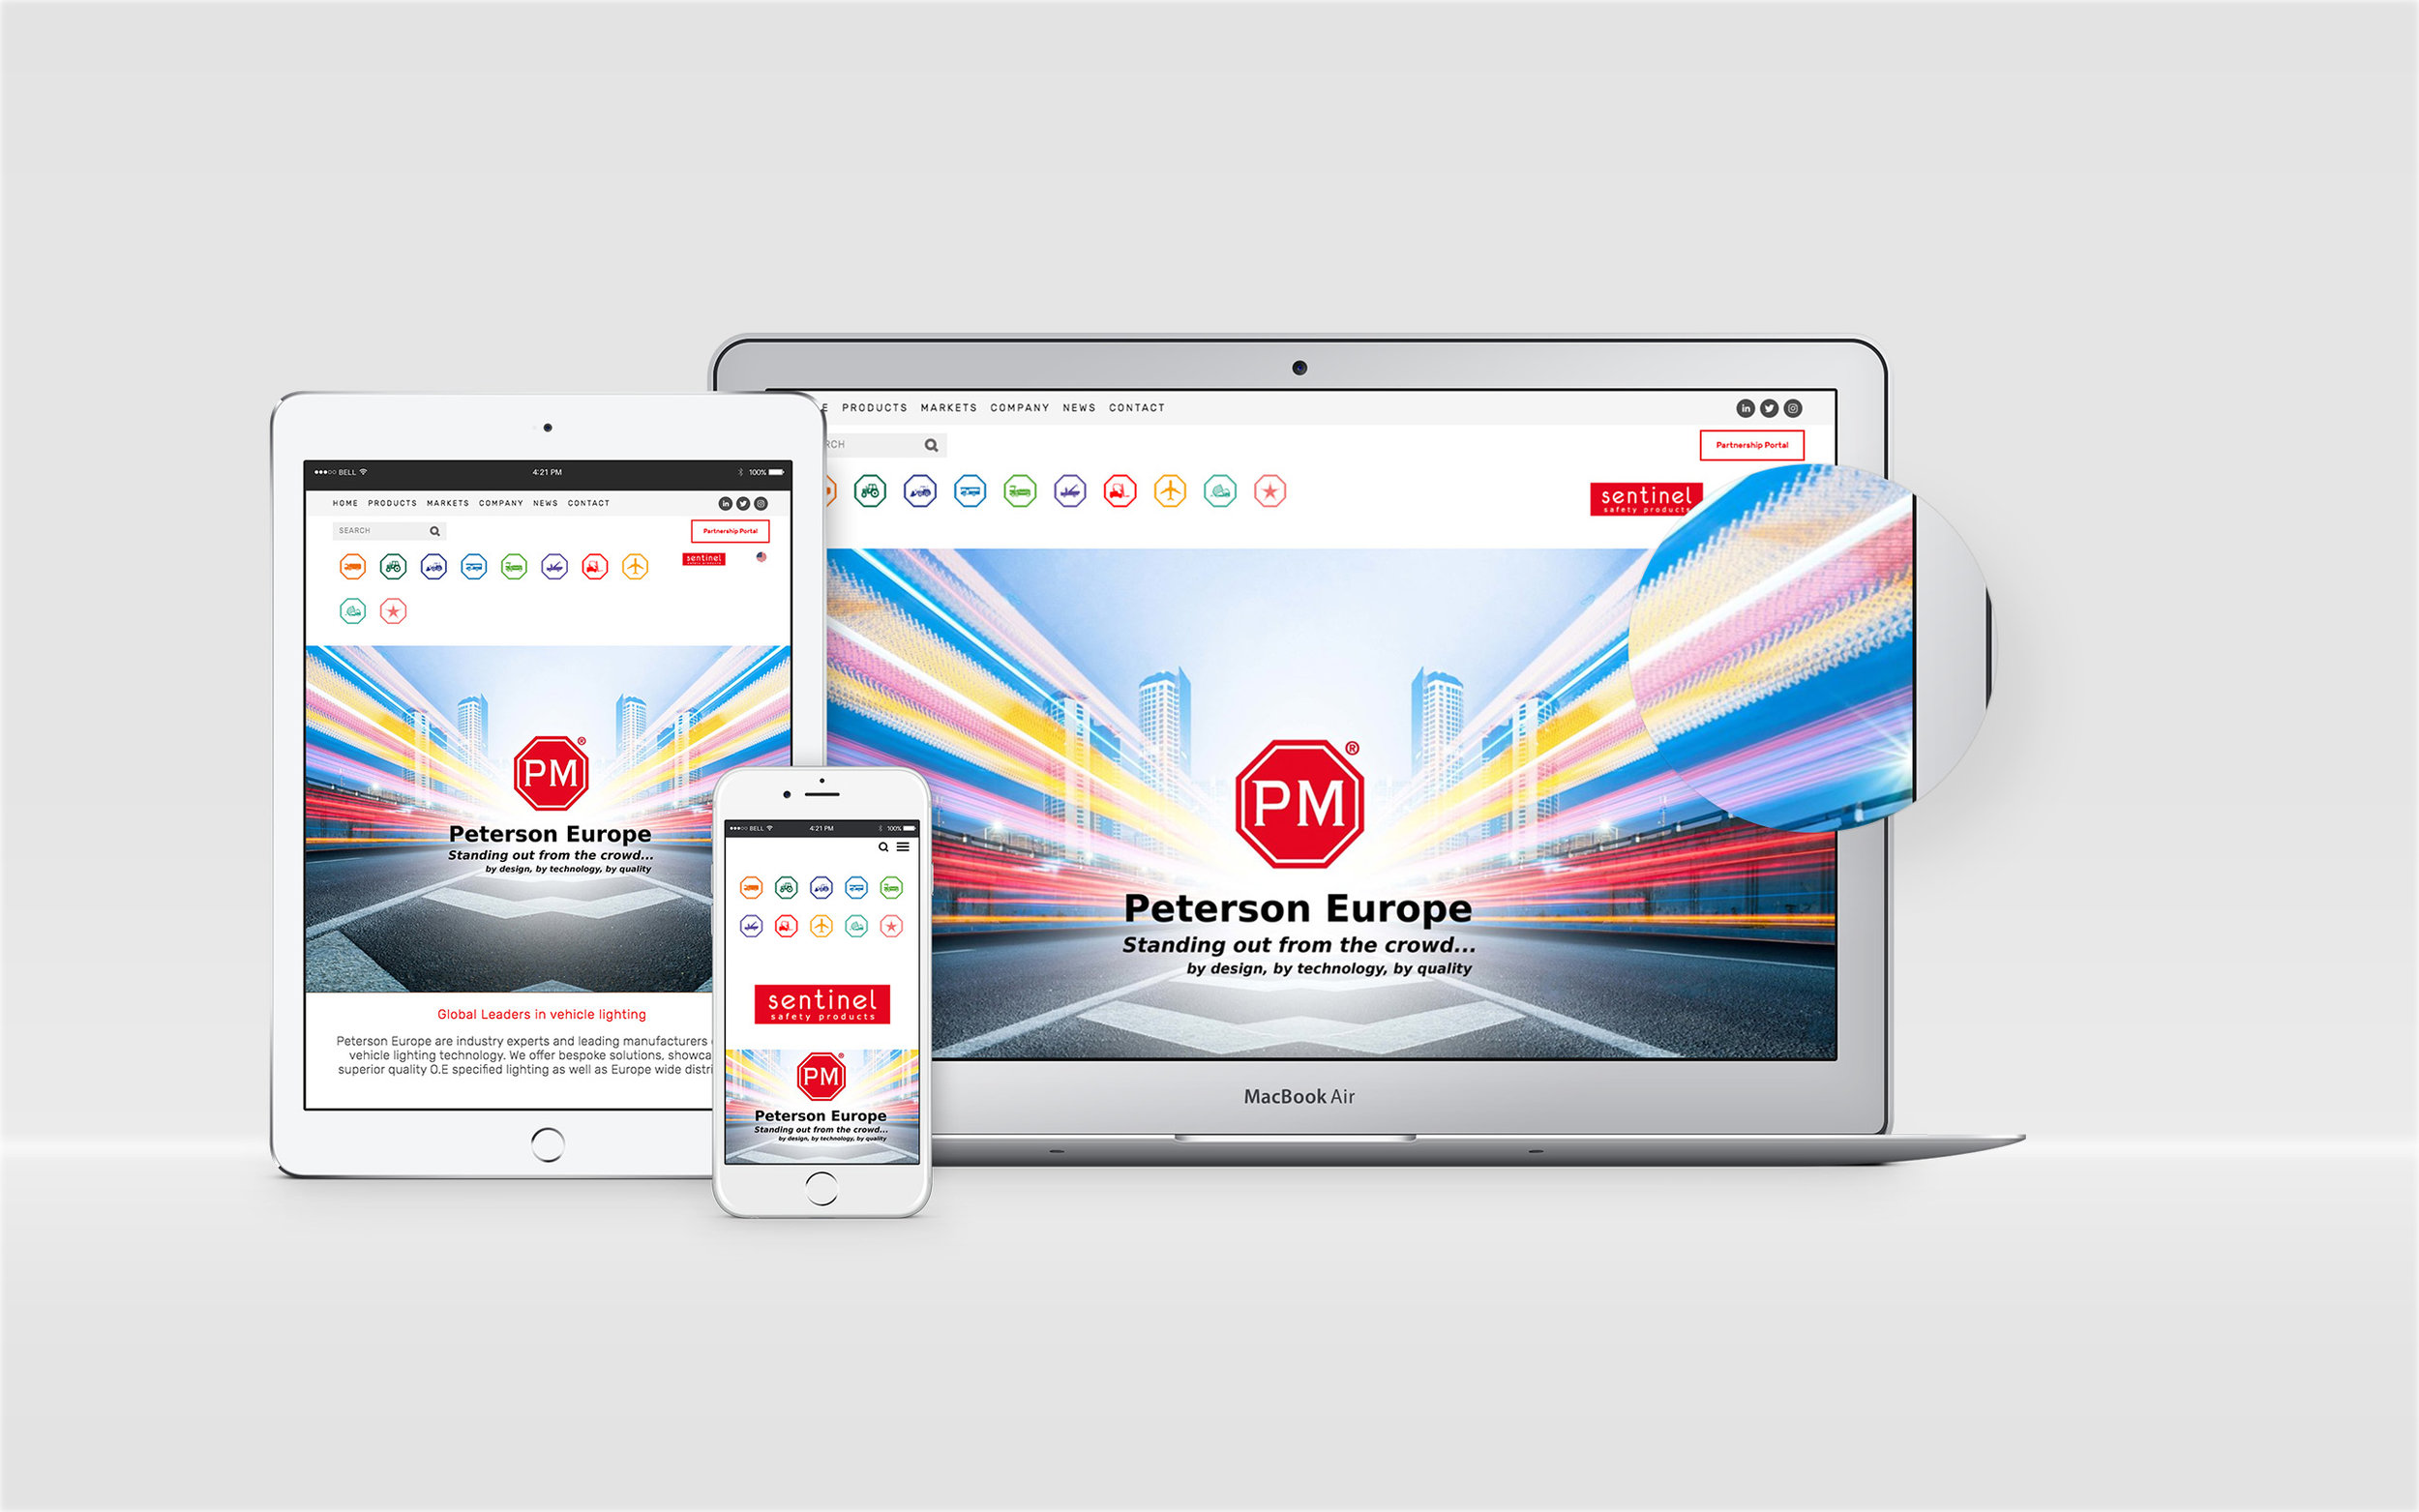 Showcas-website-PM.jpg